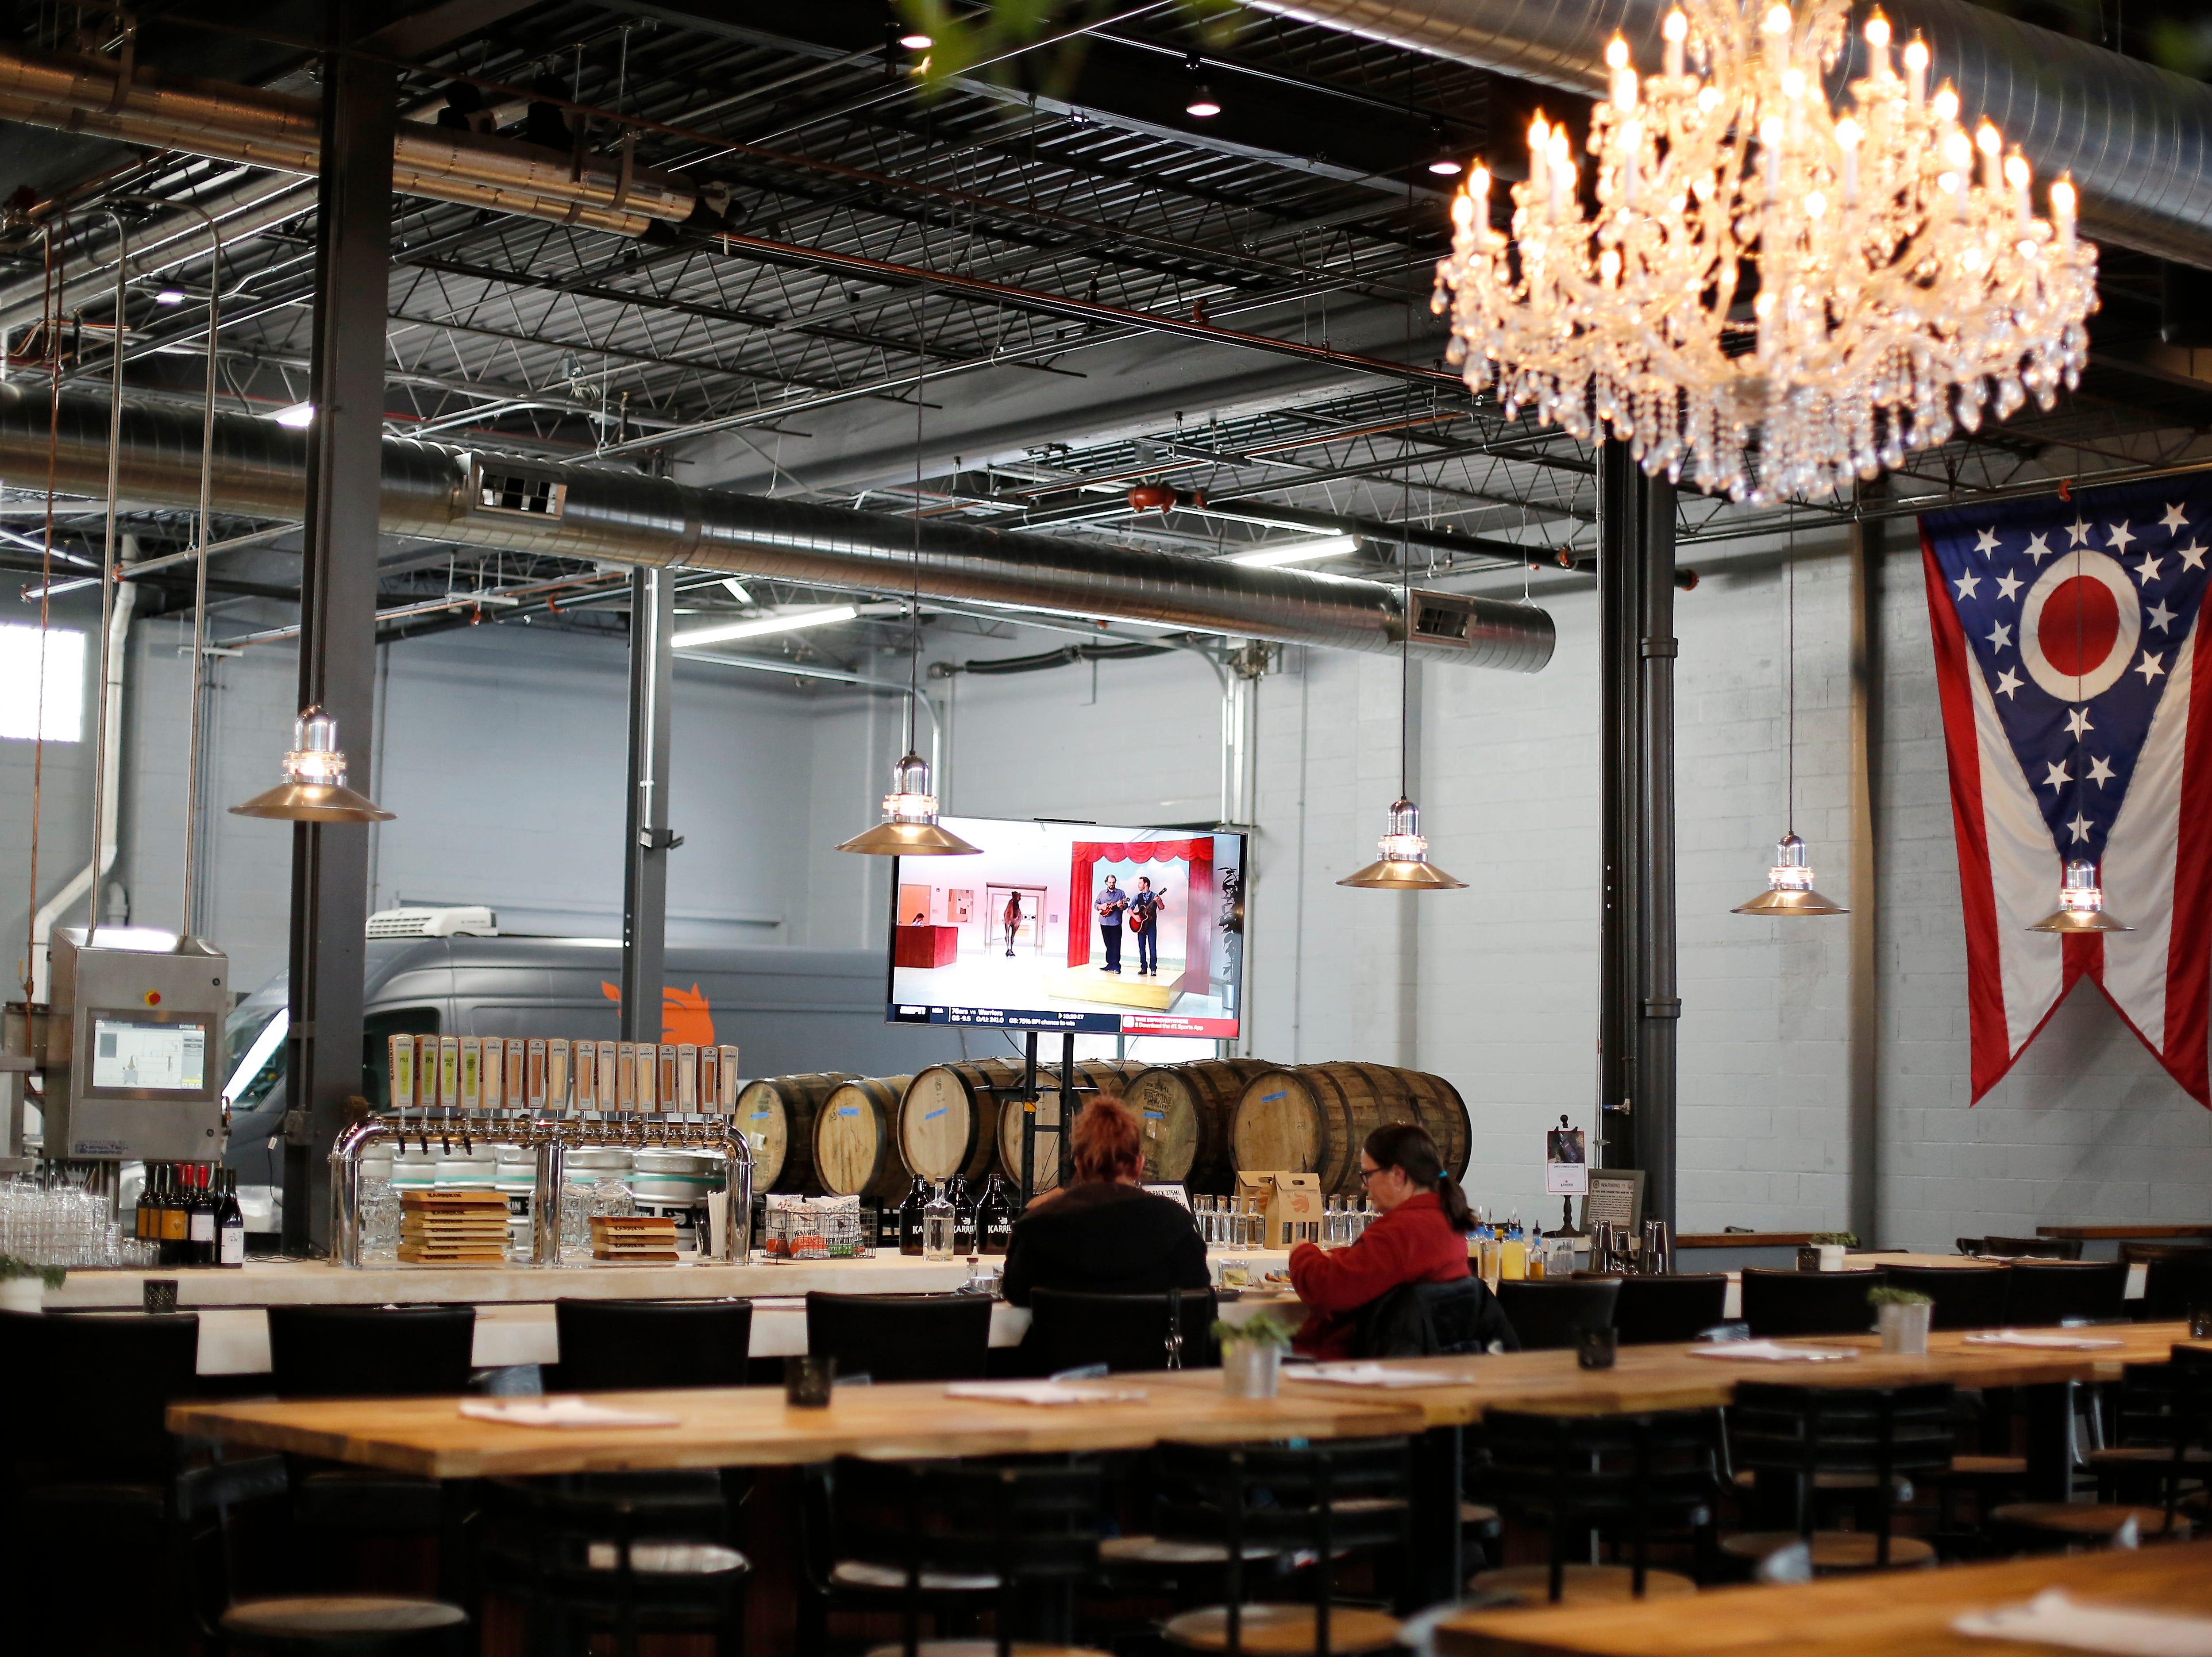 The main dining area at Karrikin Spirits Co. in the Fairfax neighborhood of Cincinnati on Thursday, Jan. 31, 2019.